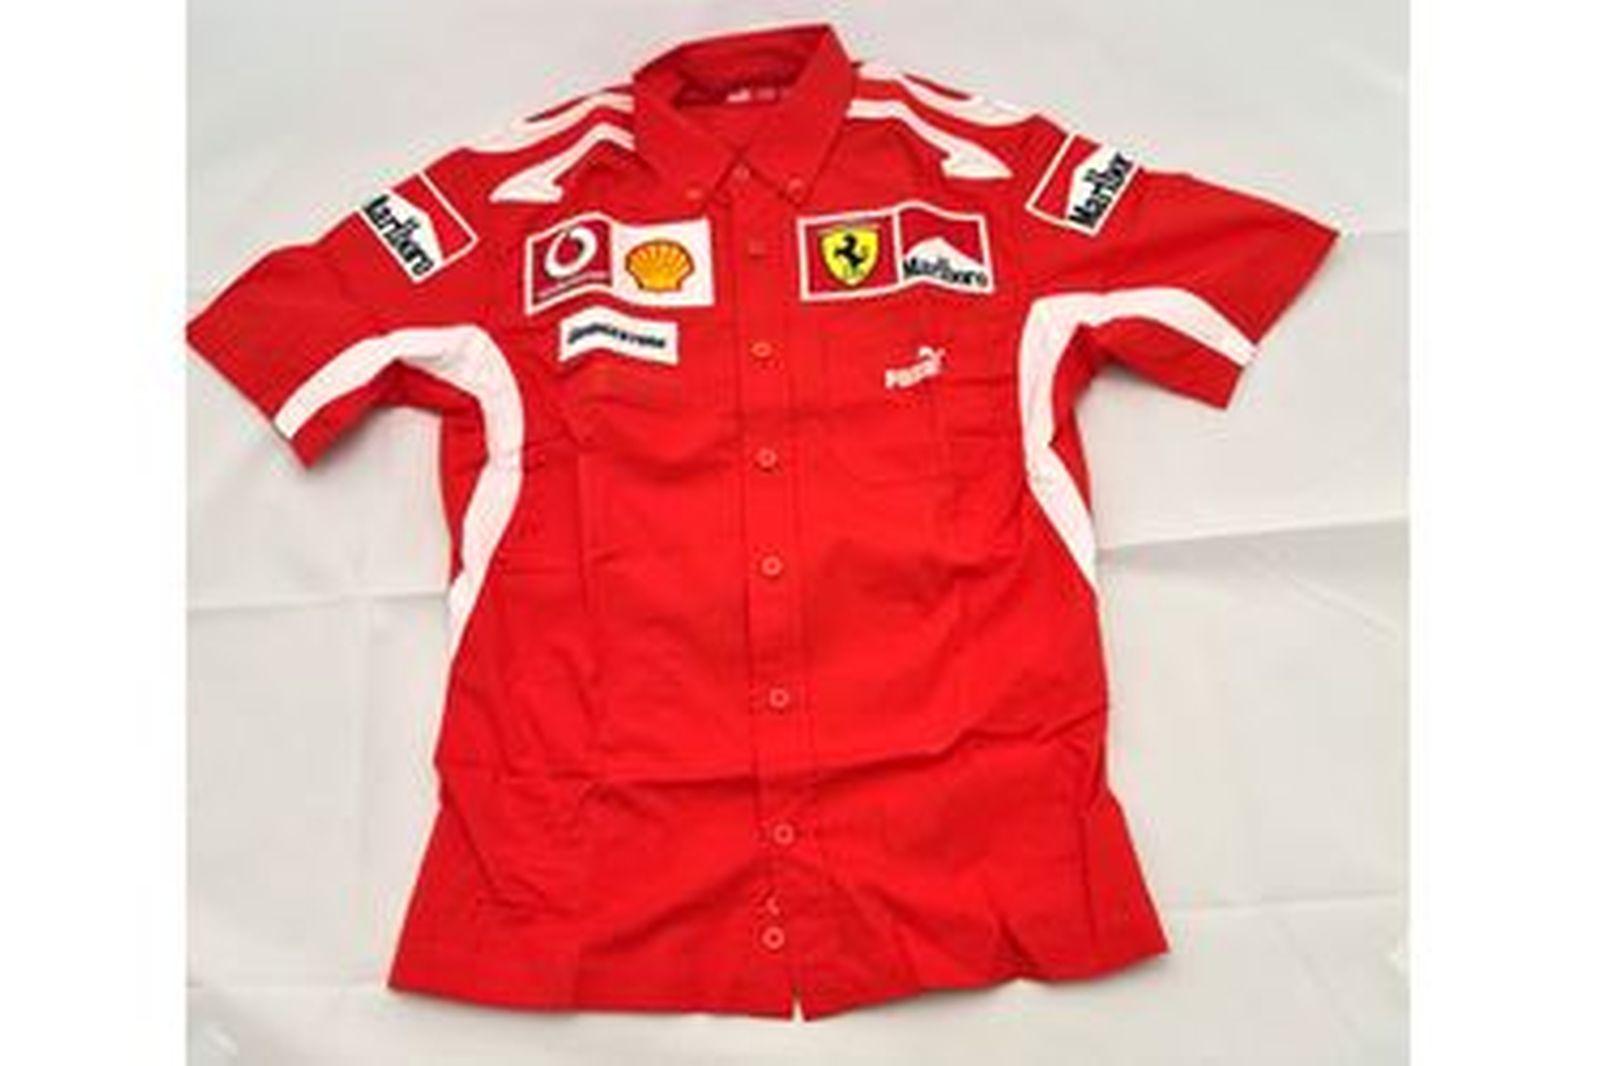 Marlboro Ferrari Team Shirt - Female size Medium